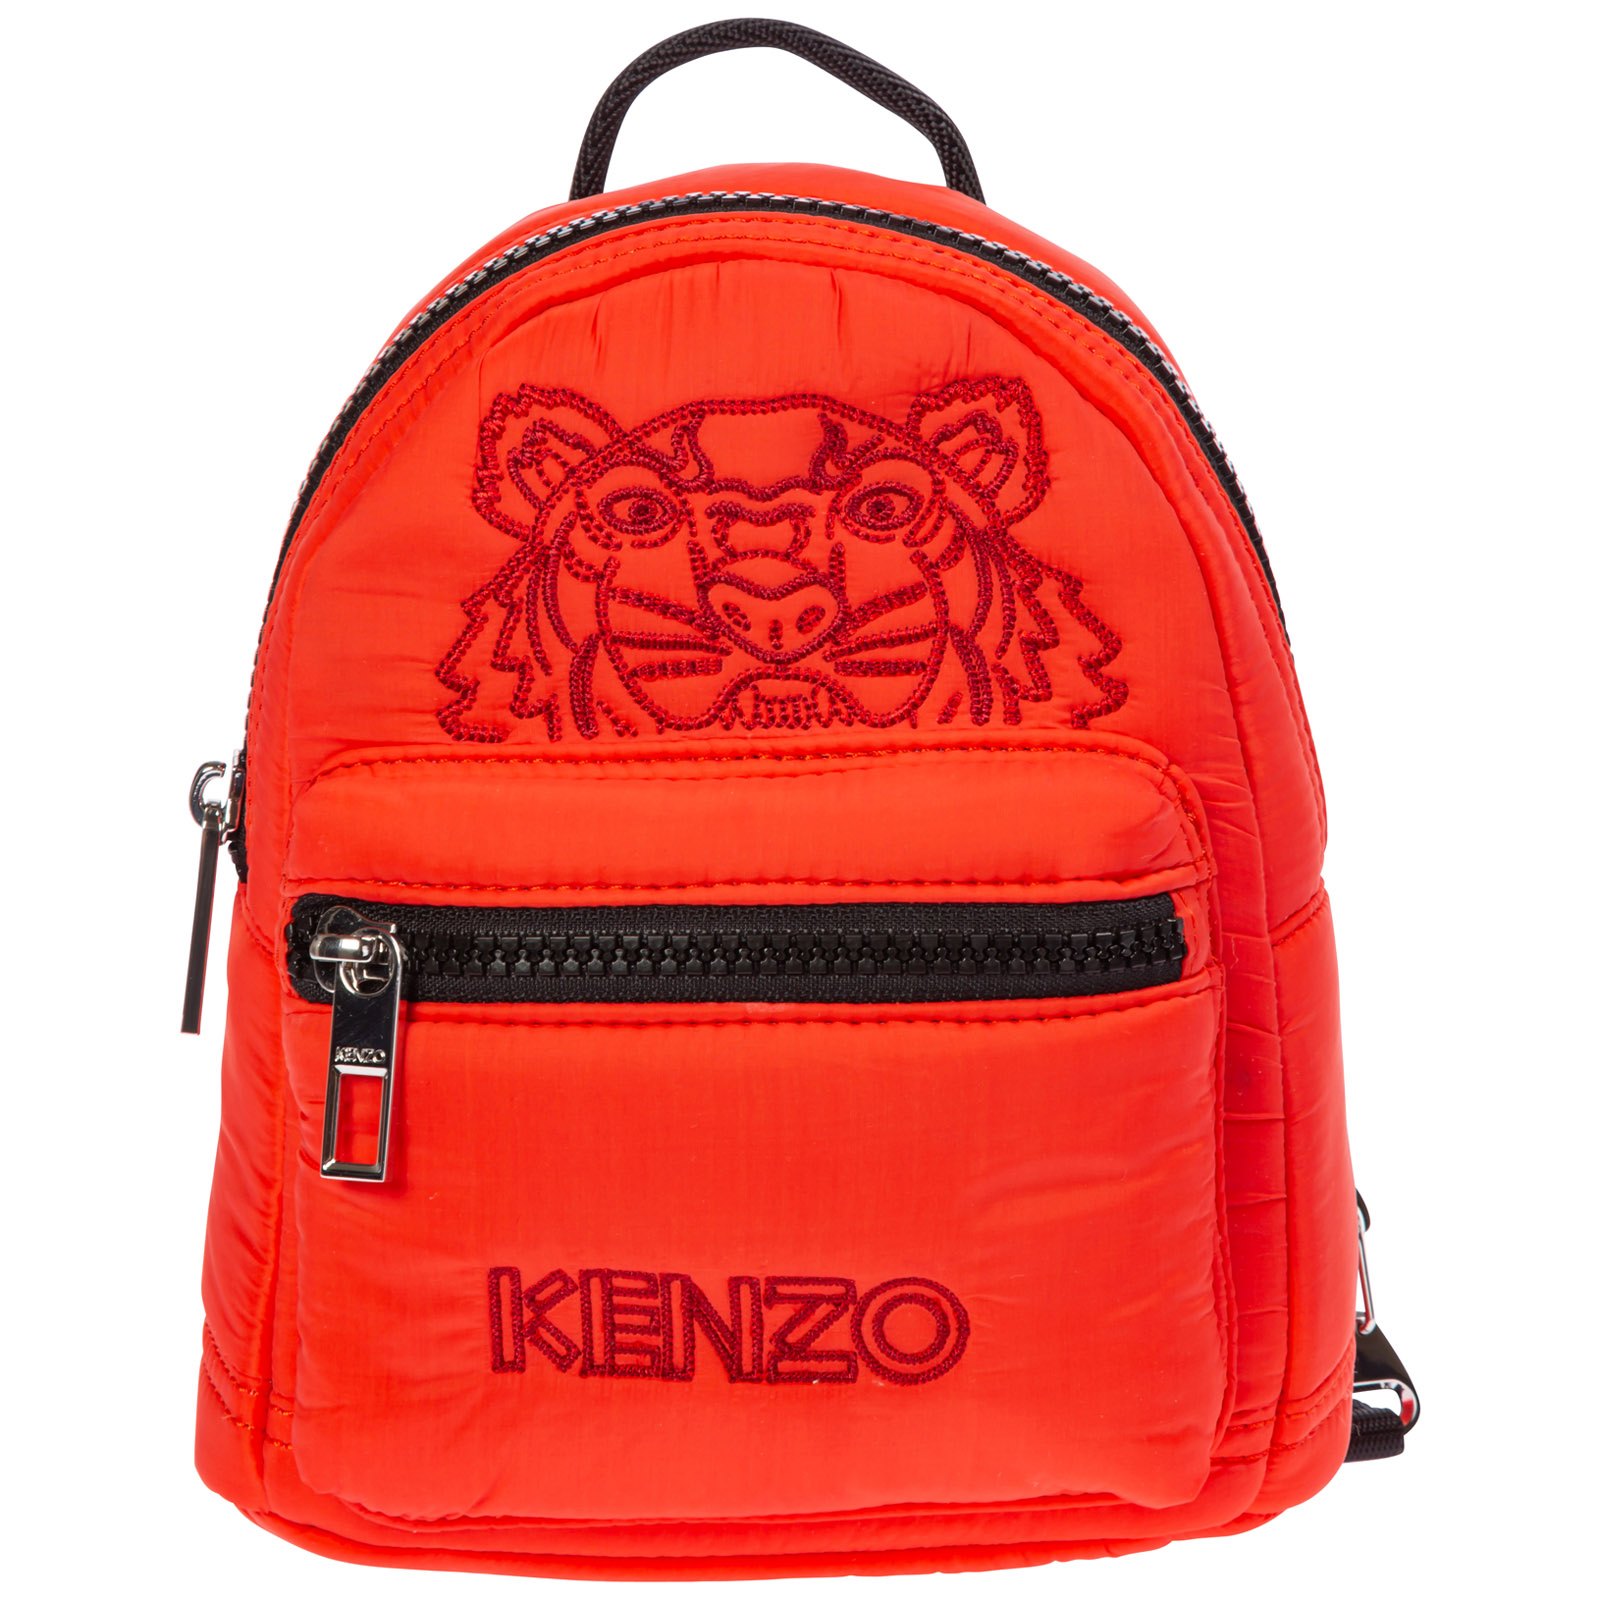 Kenzo Women's Rucksack Backpack Travel  Tiger In Red